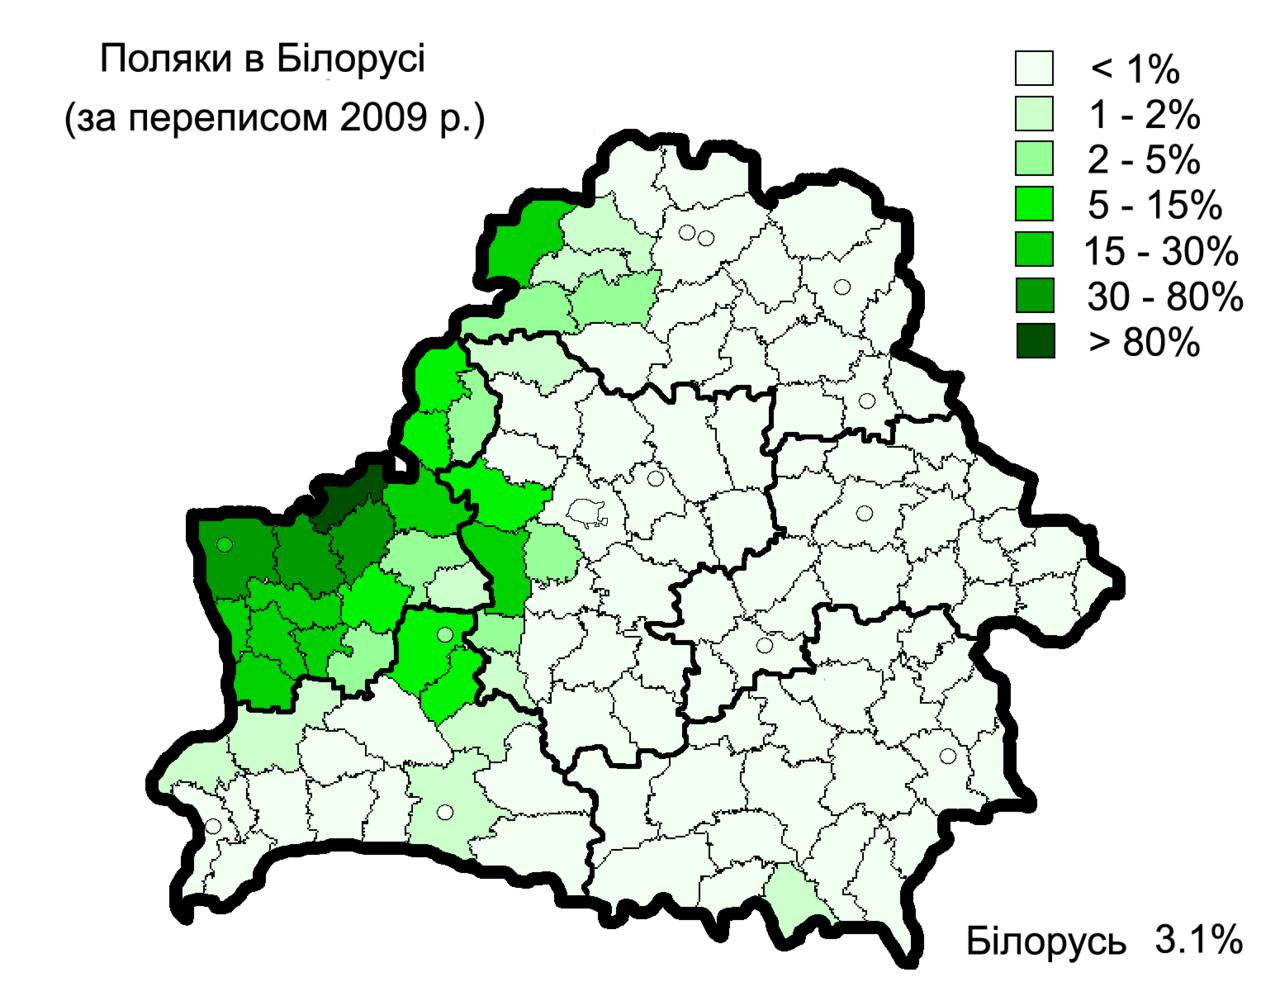 Belarus maps Eurasian Geopolitics